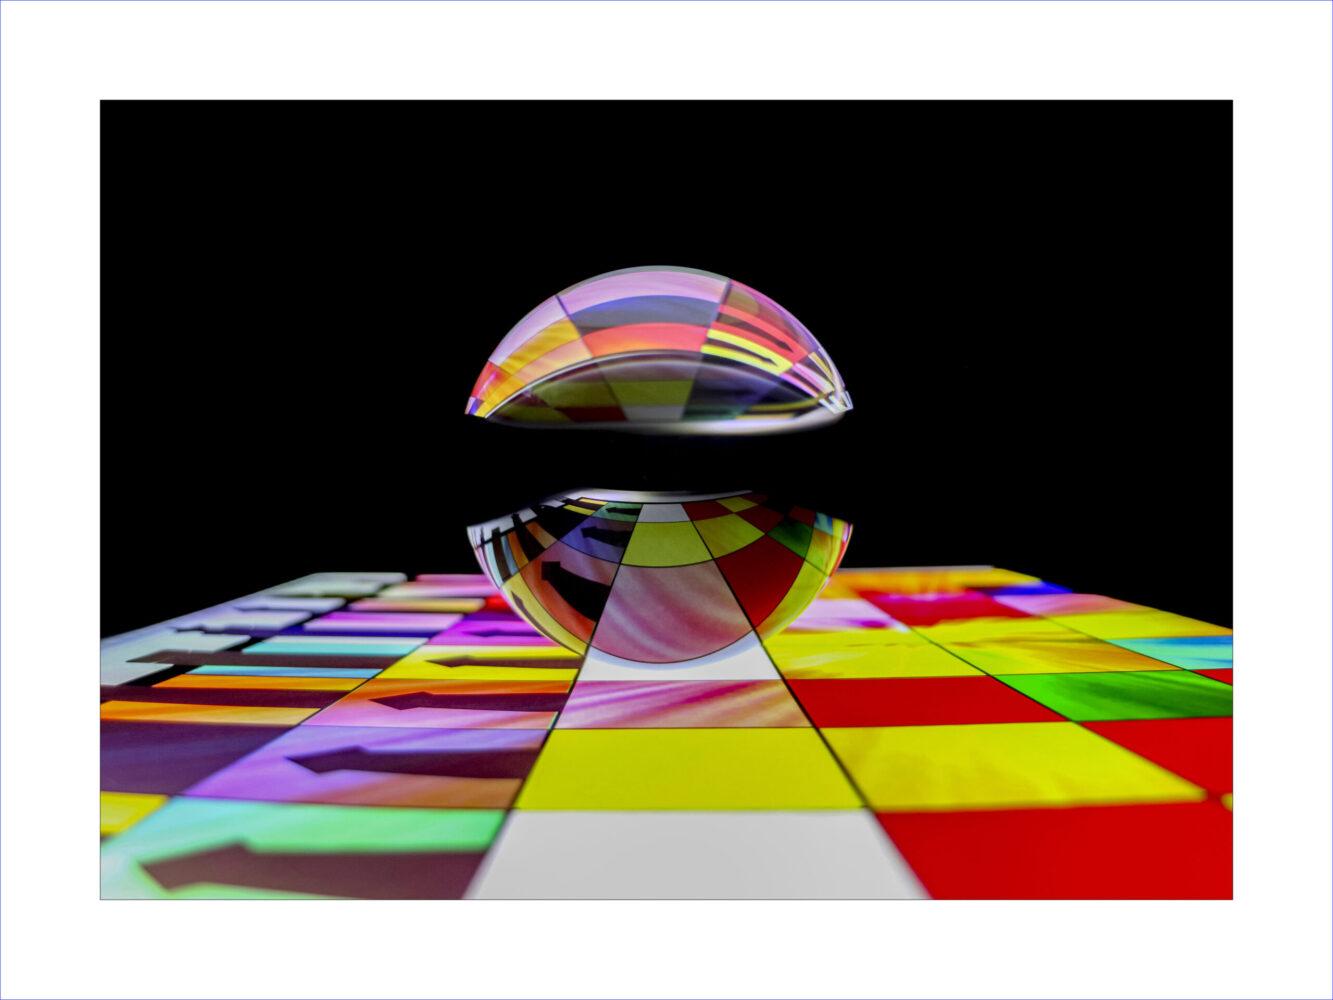 Chessboard & Sphere_2343